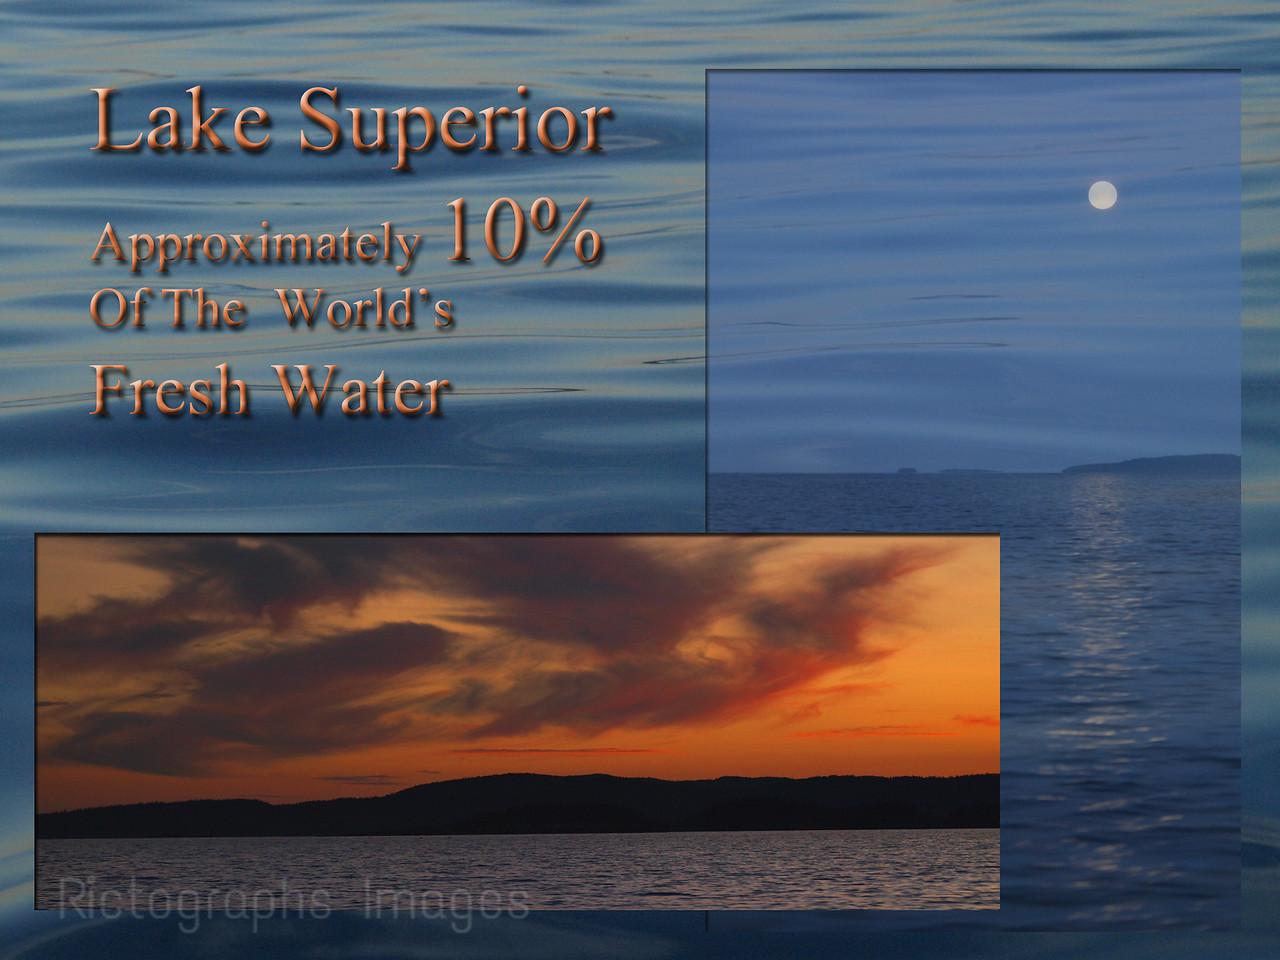 Lake Superior News